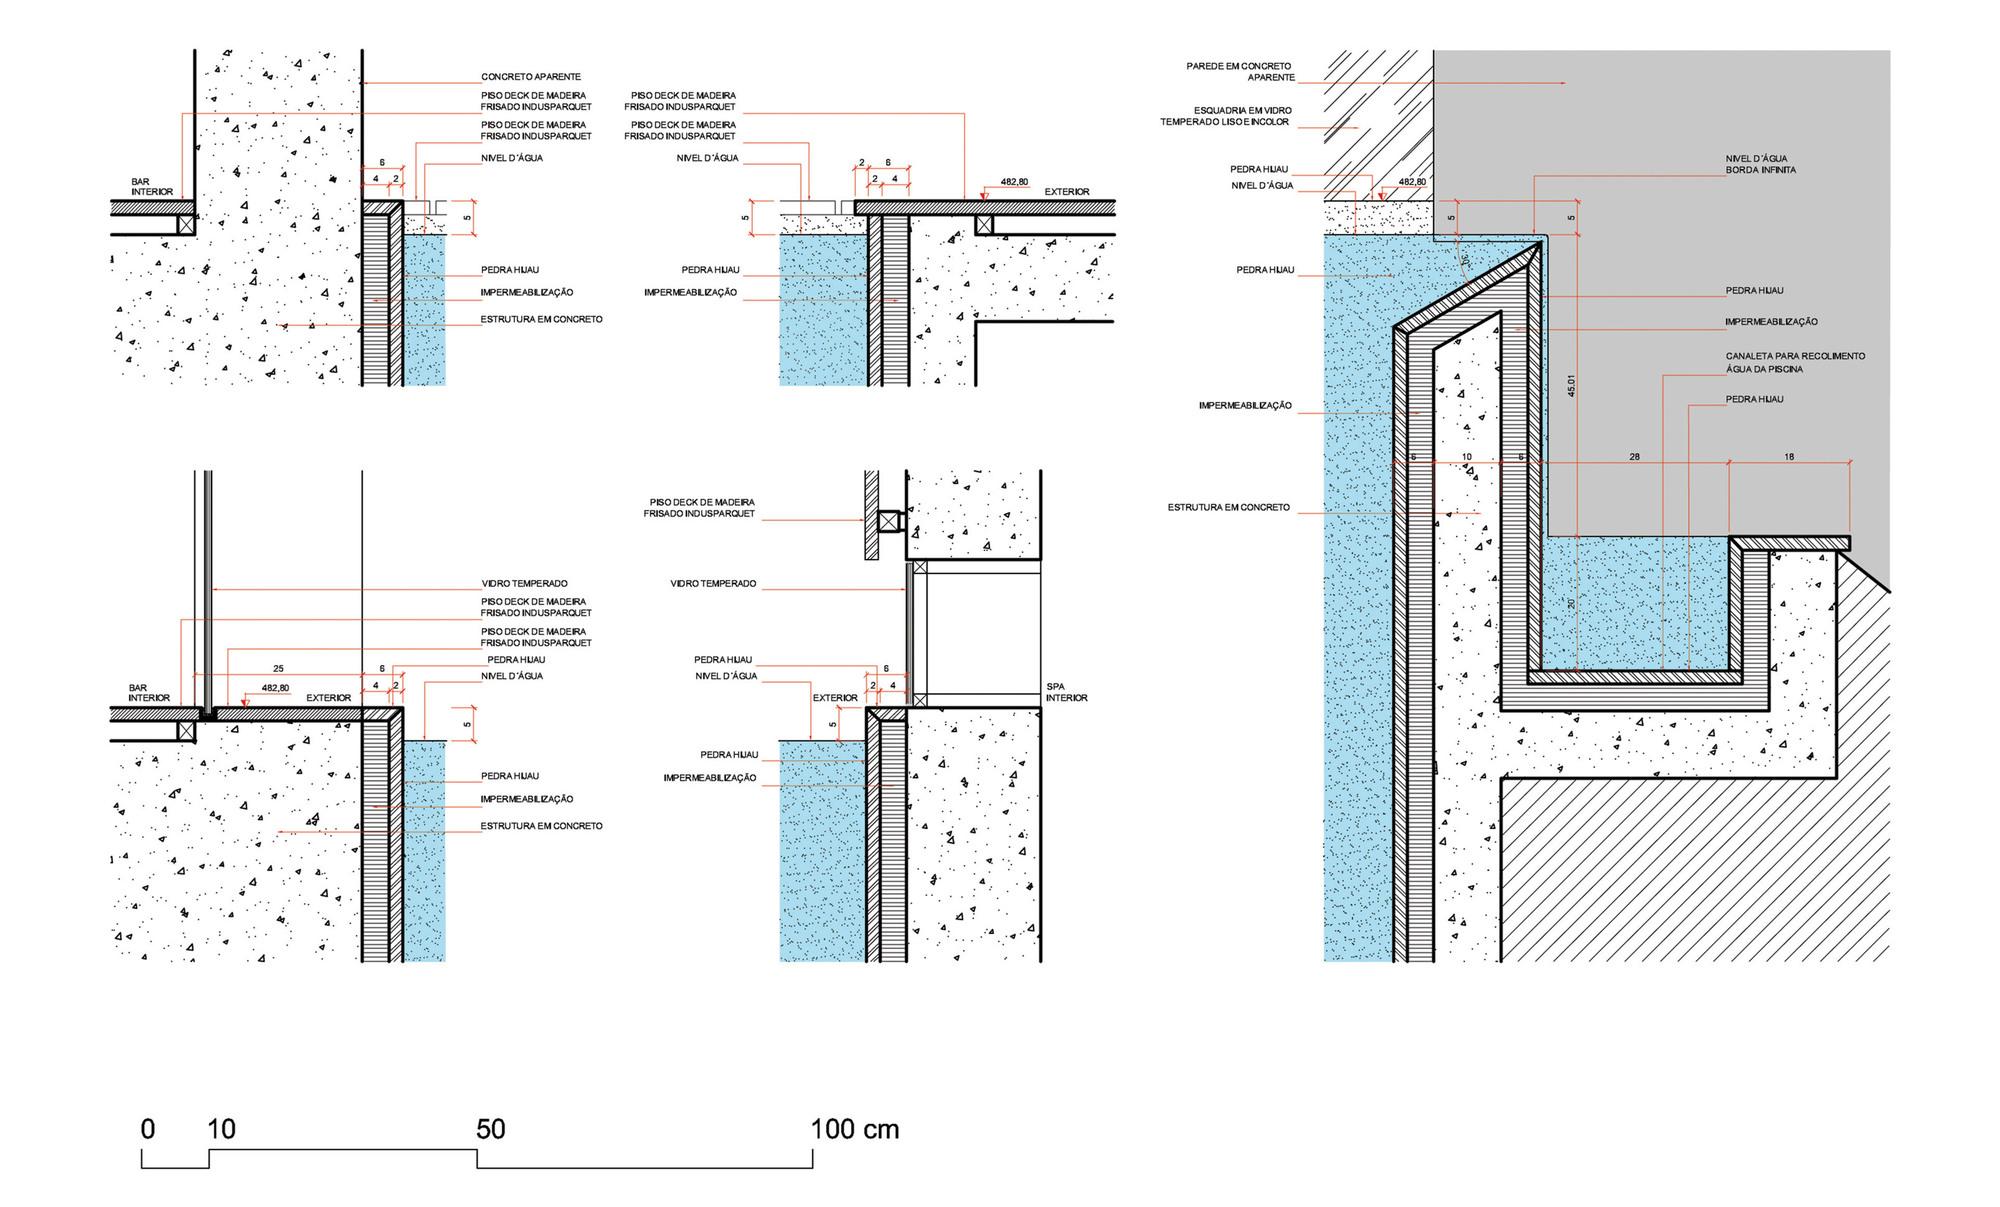 detalhe construtivo piscina borba infinita